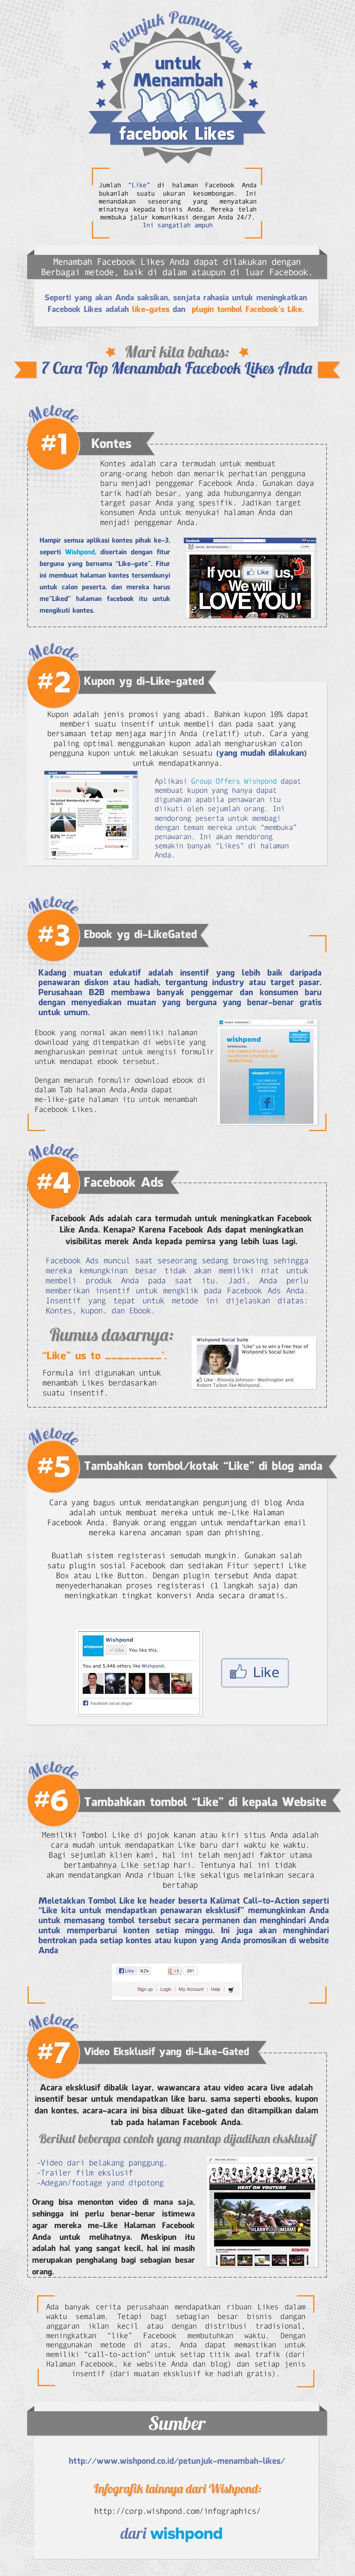 [Infographic-cara-menambah-likers-fanpage-facebook